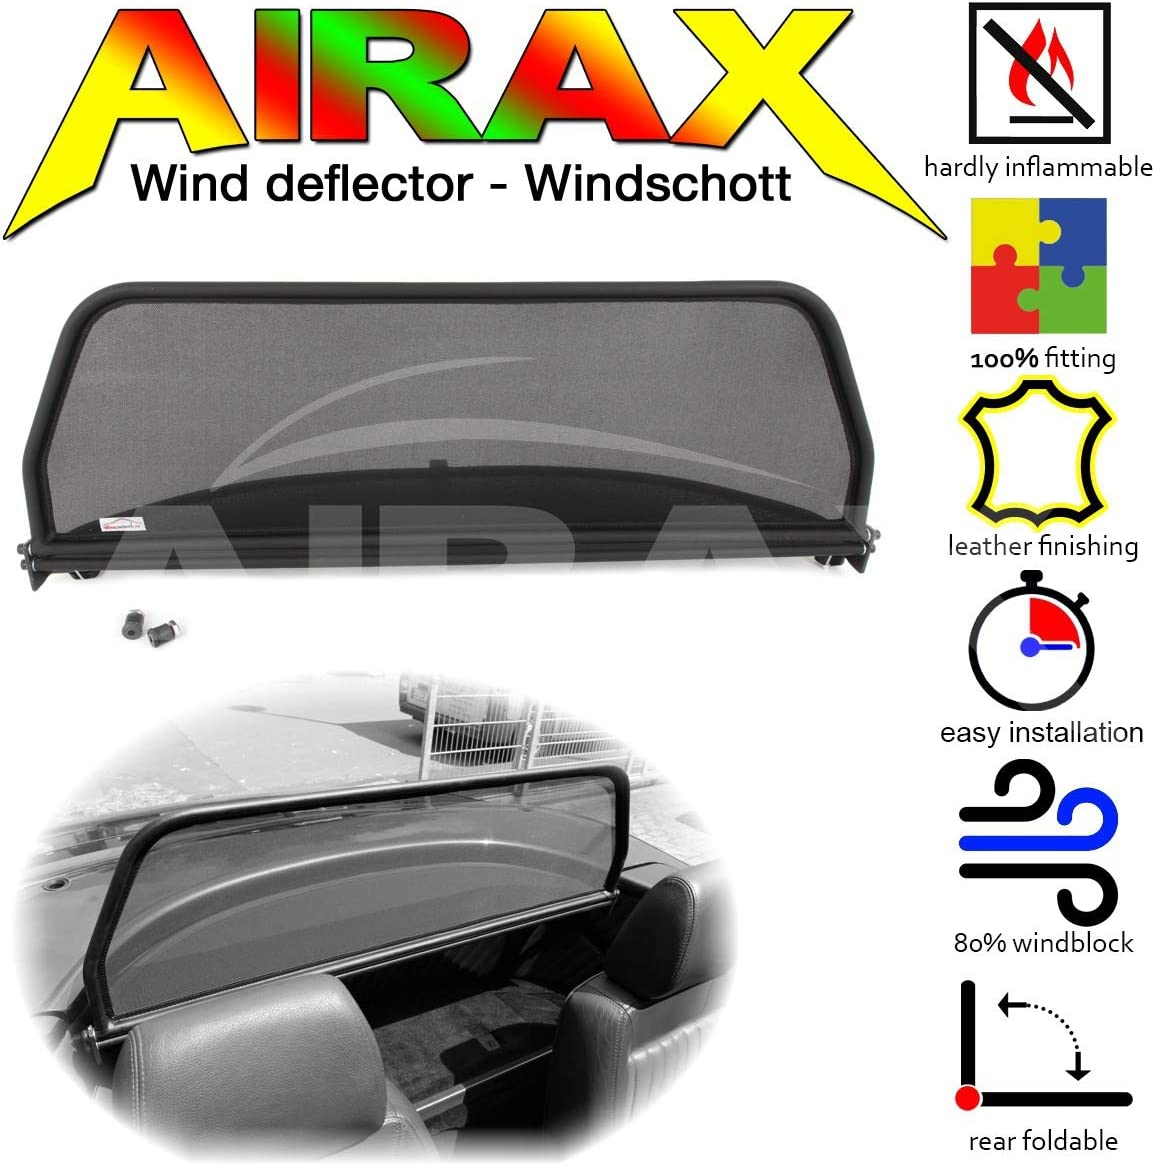 1994-2006 Airax Déflecteur Vent Deflector windscherm Alfa Romeo Spider 916 Bj